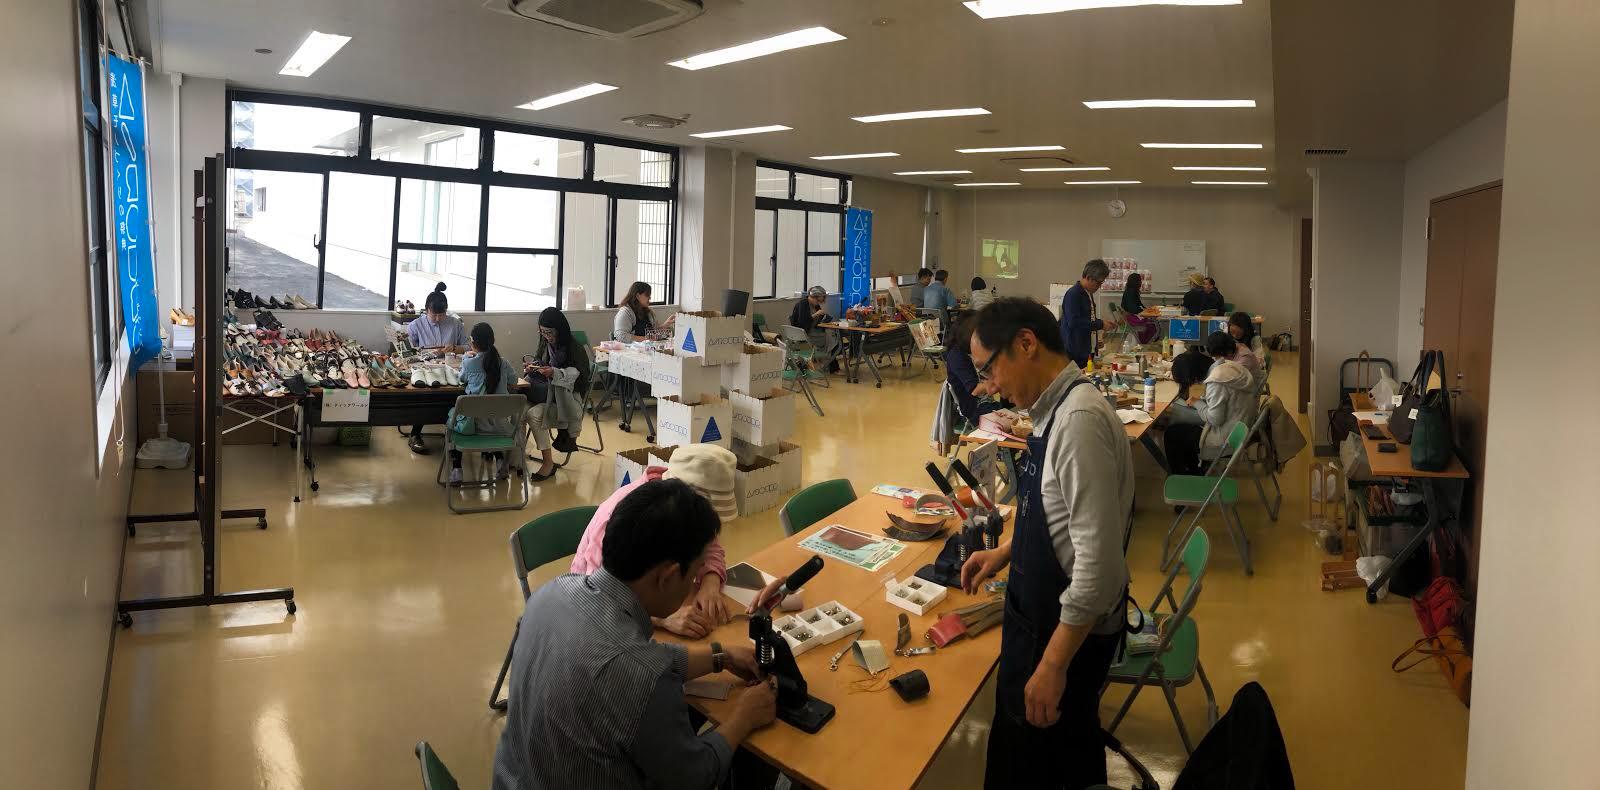 A–ROUND 2019 SPRING 浅草 ワークショップ カップホルダー 株式会社丸上